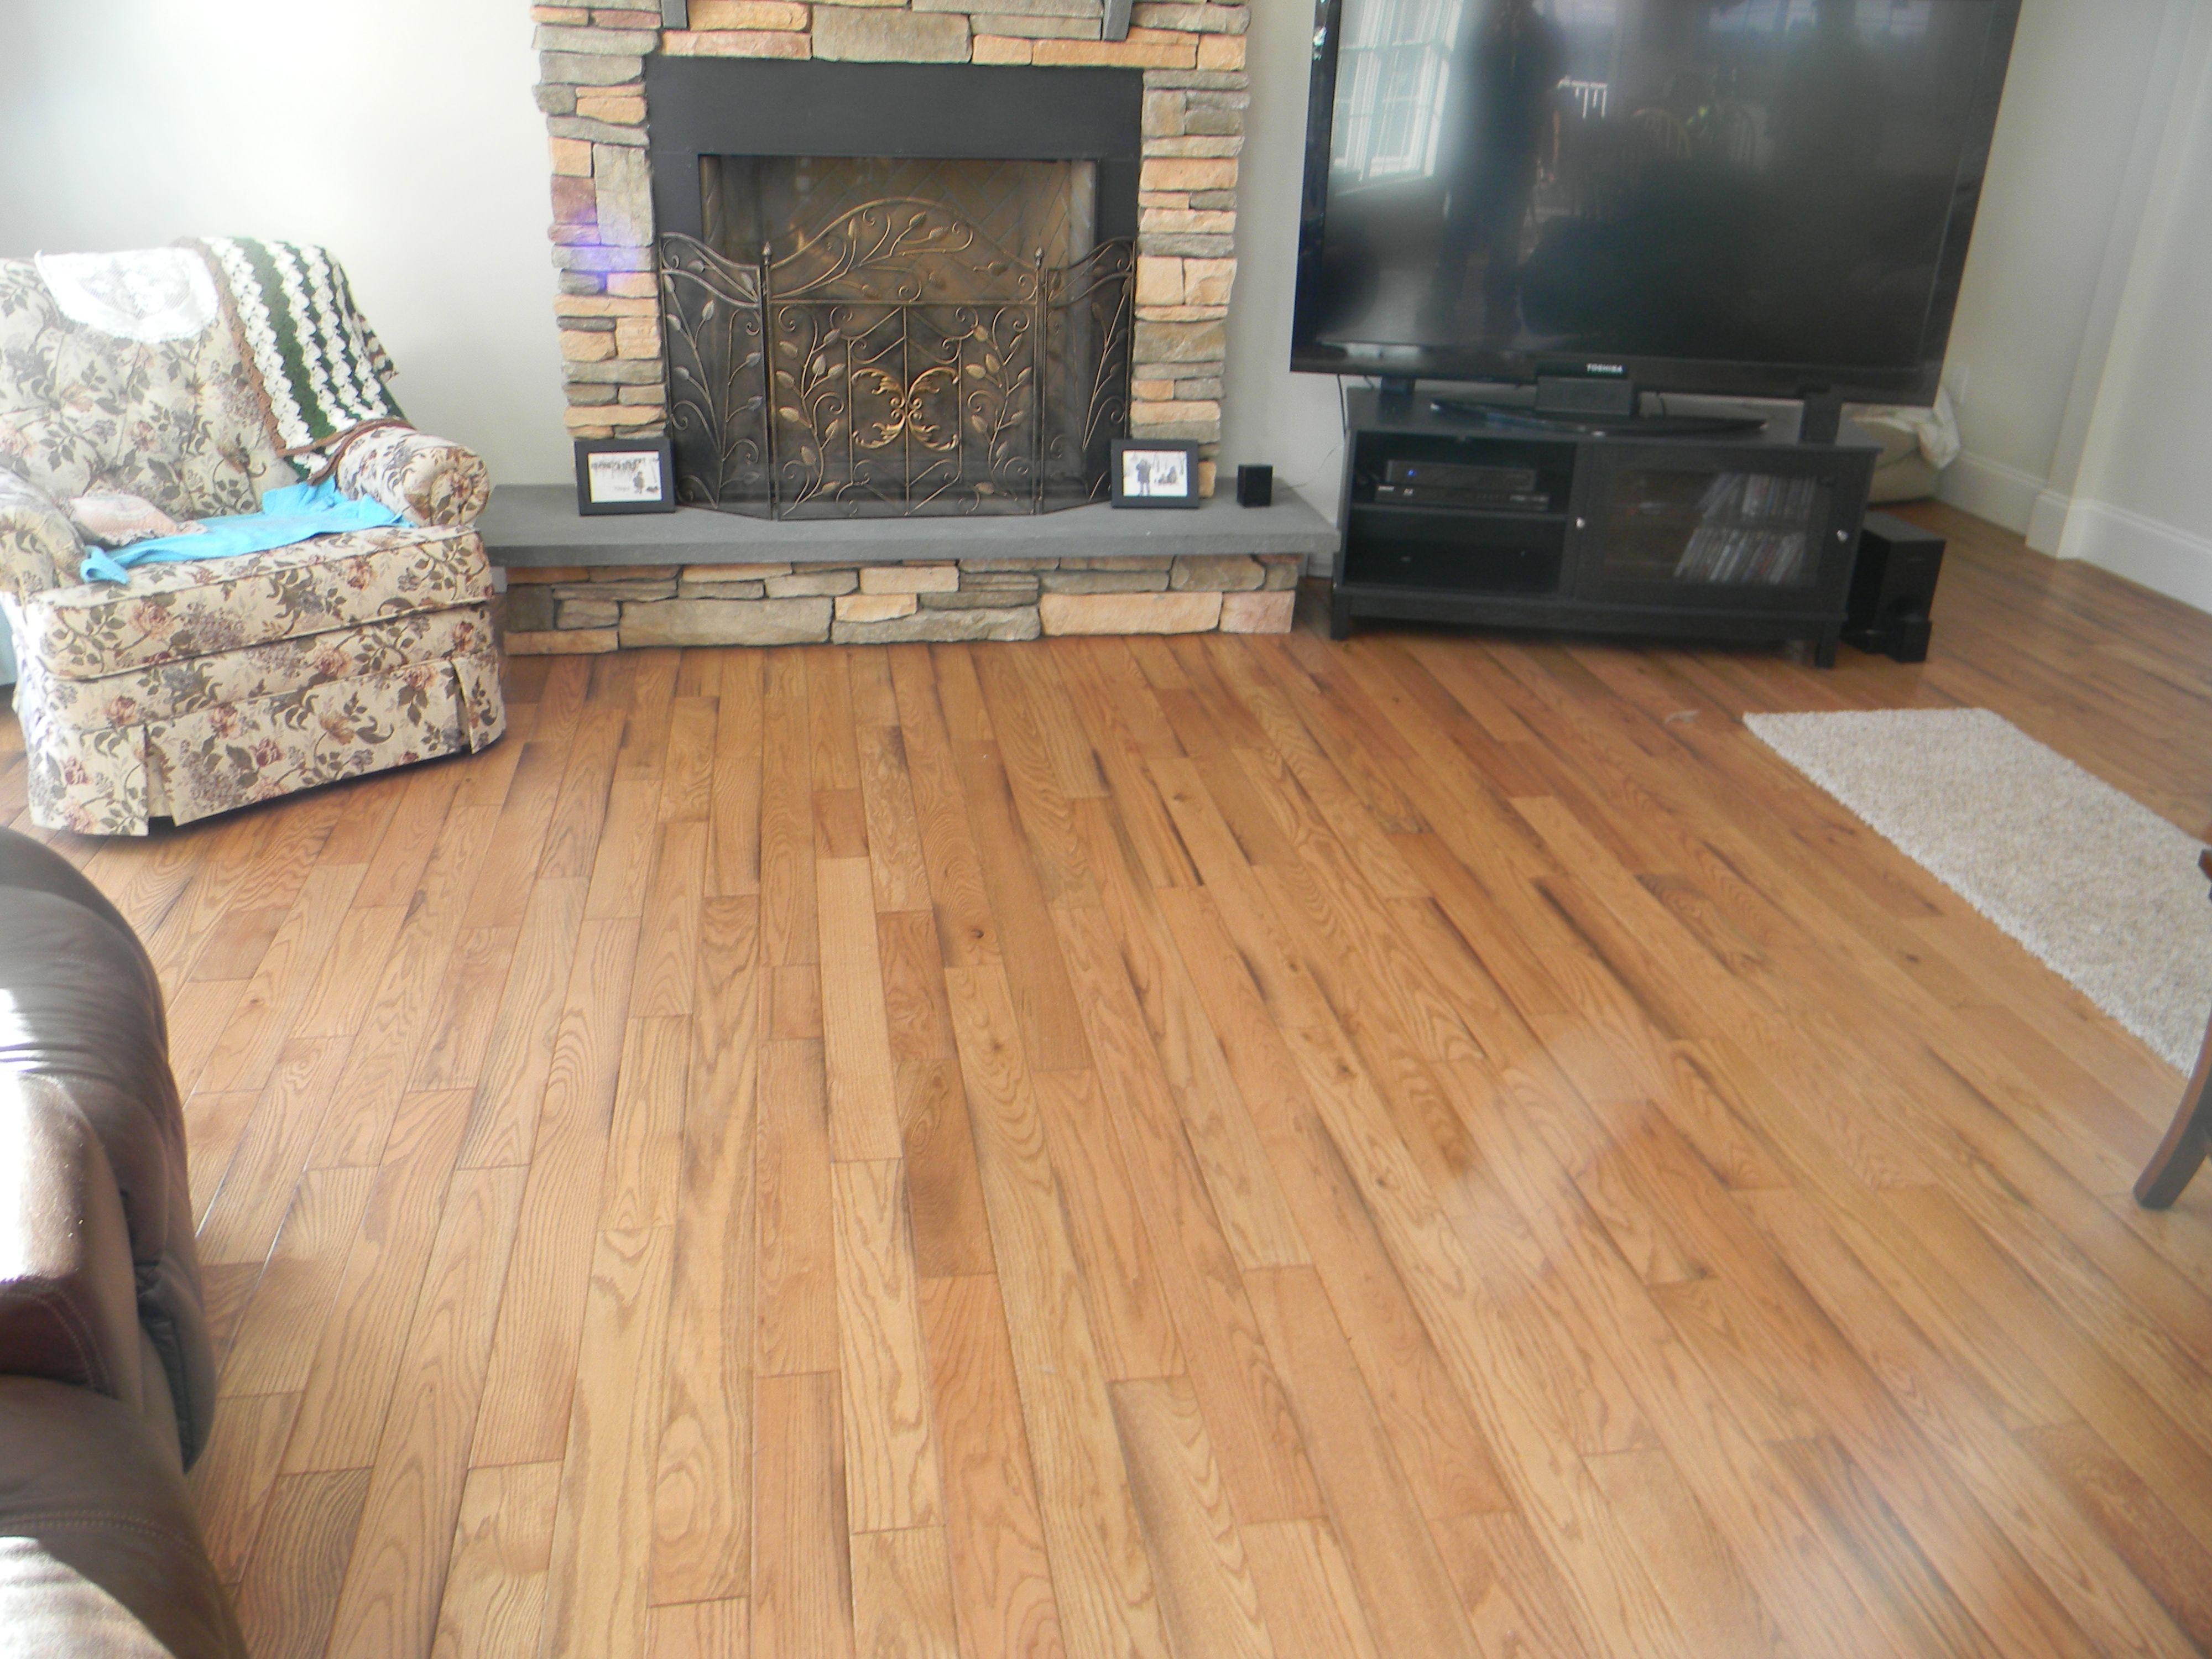 Cork flooring vs wood laminate httpdreamhomesbyrob cork flooring vs wood laminate dailygadgetfo Choice Image